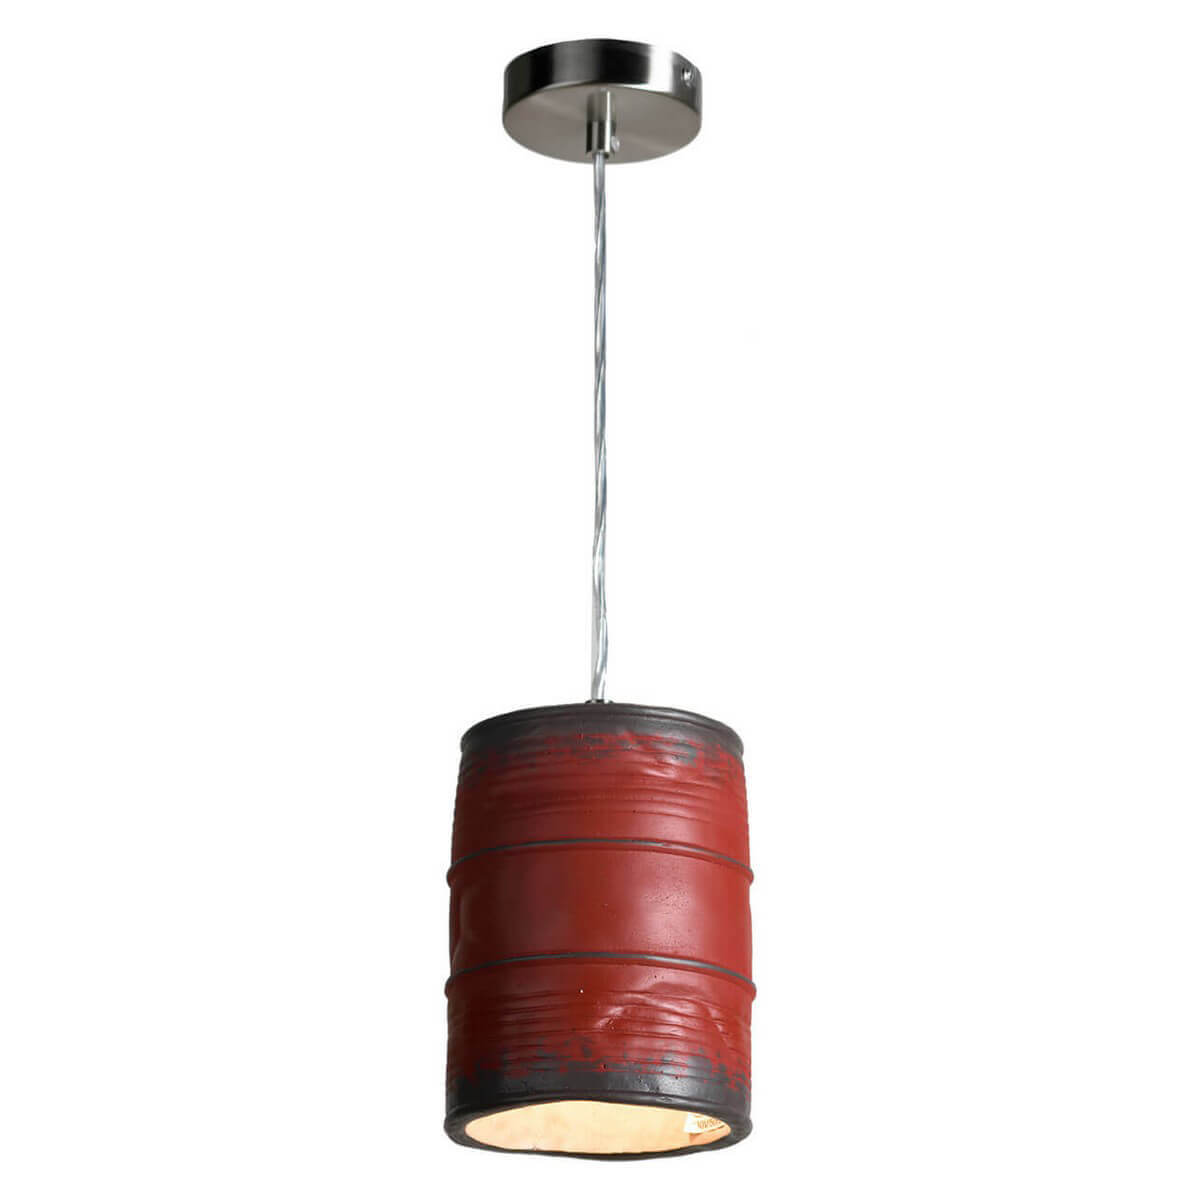 цена на Светильник Lussole LOFT LSP-9527 LSP-9525